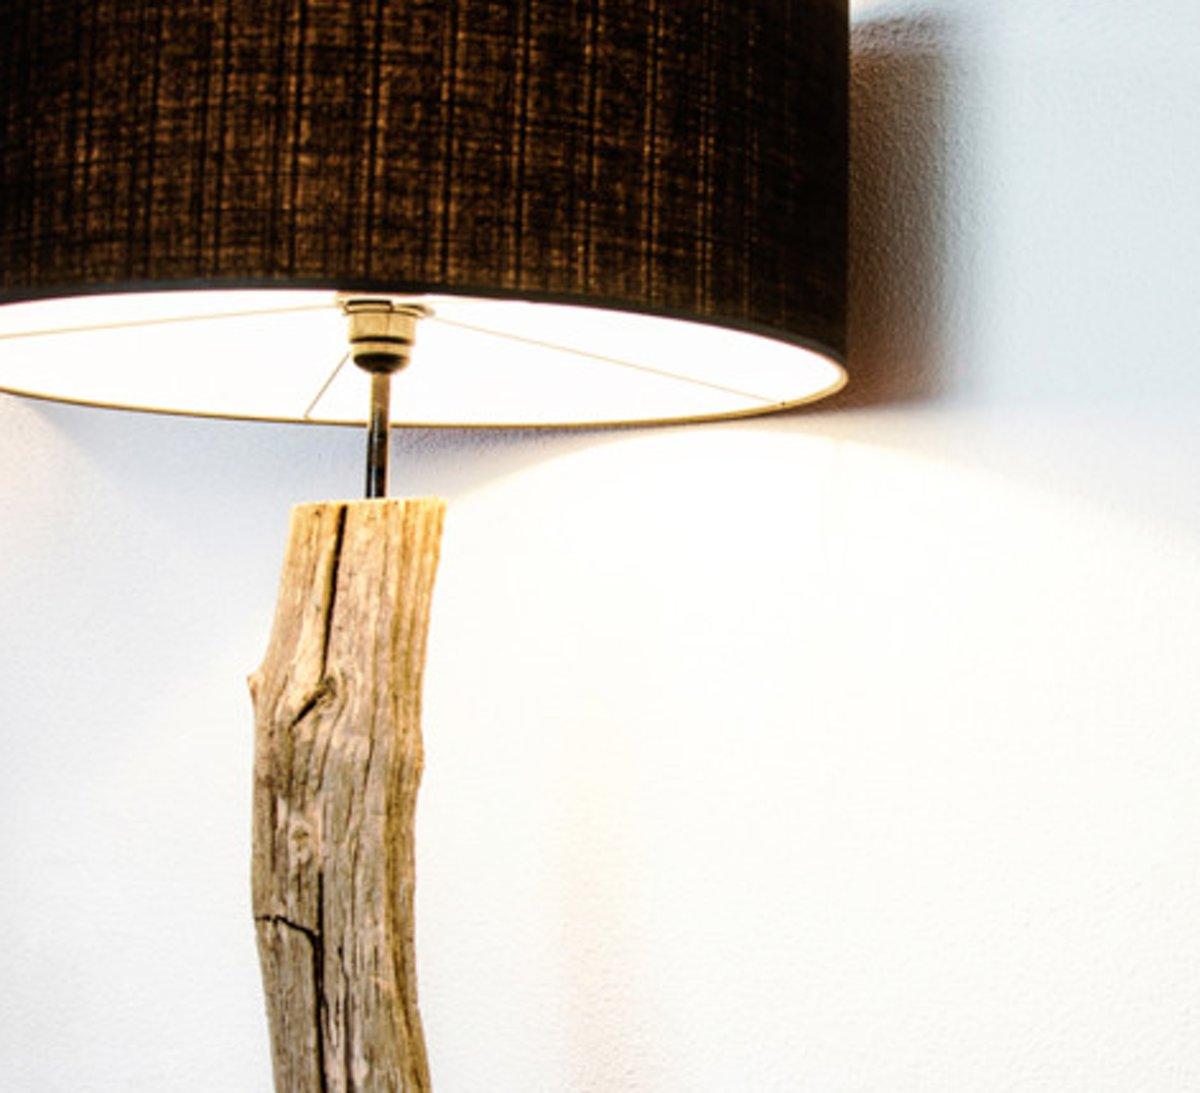 Genoeg bol.com | Houten boomstronk vloerlamp (kap blauw) #JU99